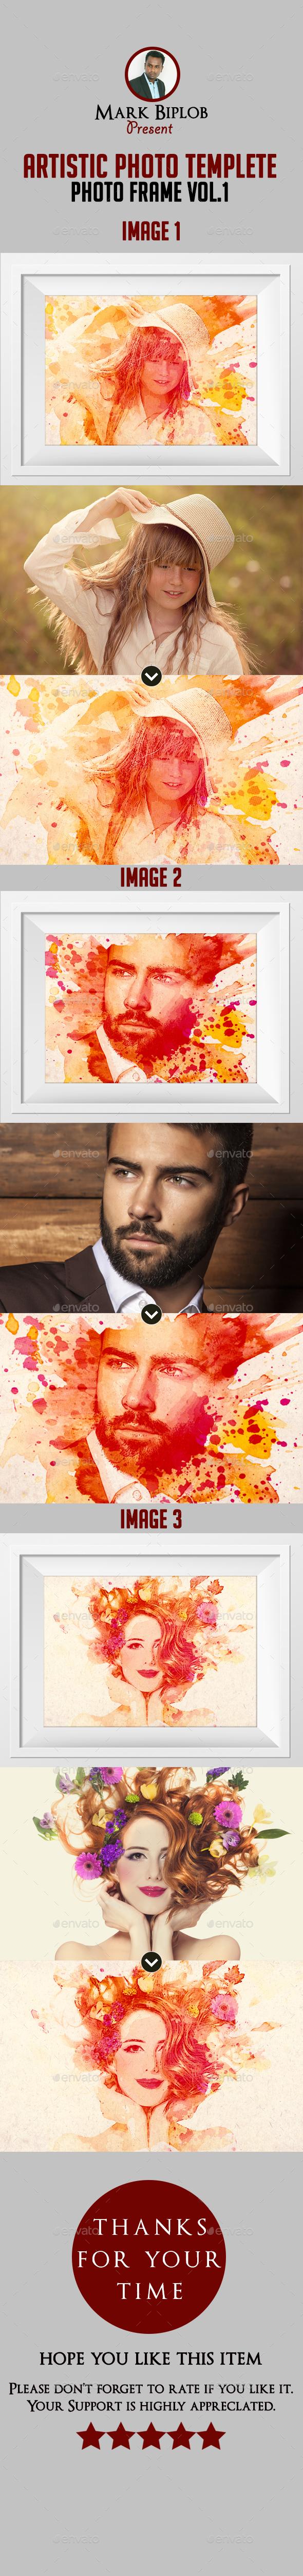 Artistic Photo Manipulation Template  - Artistic Photo Templates